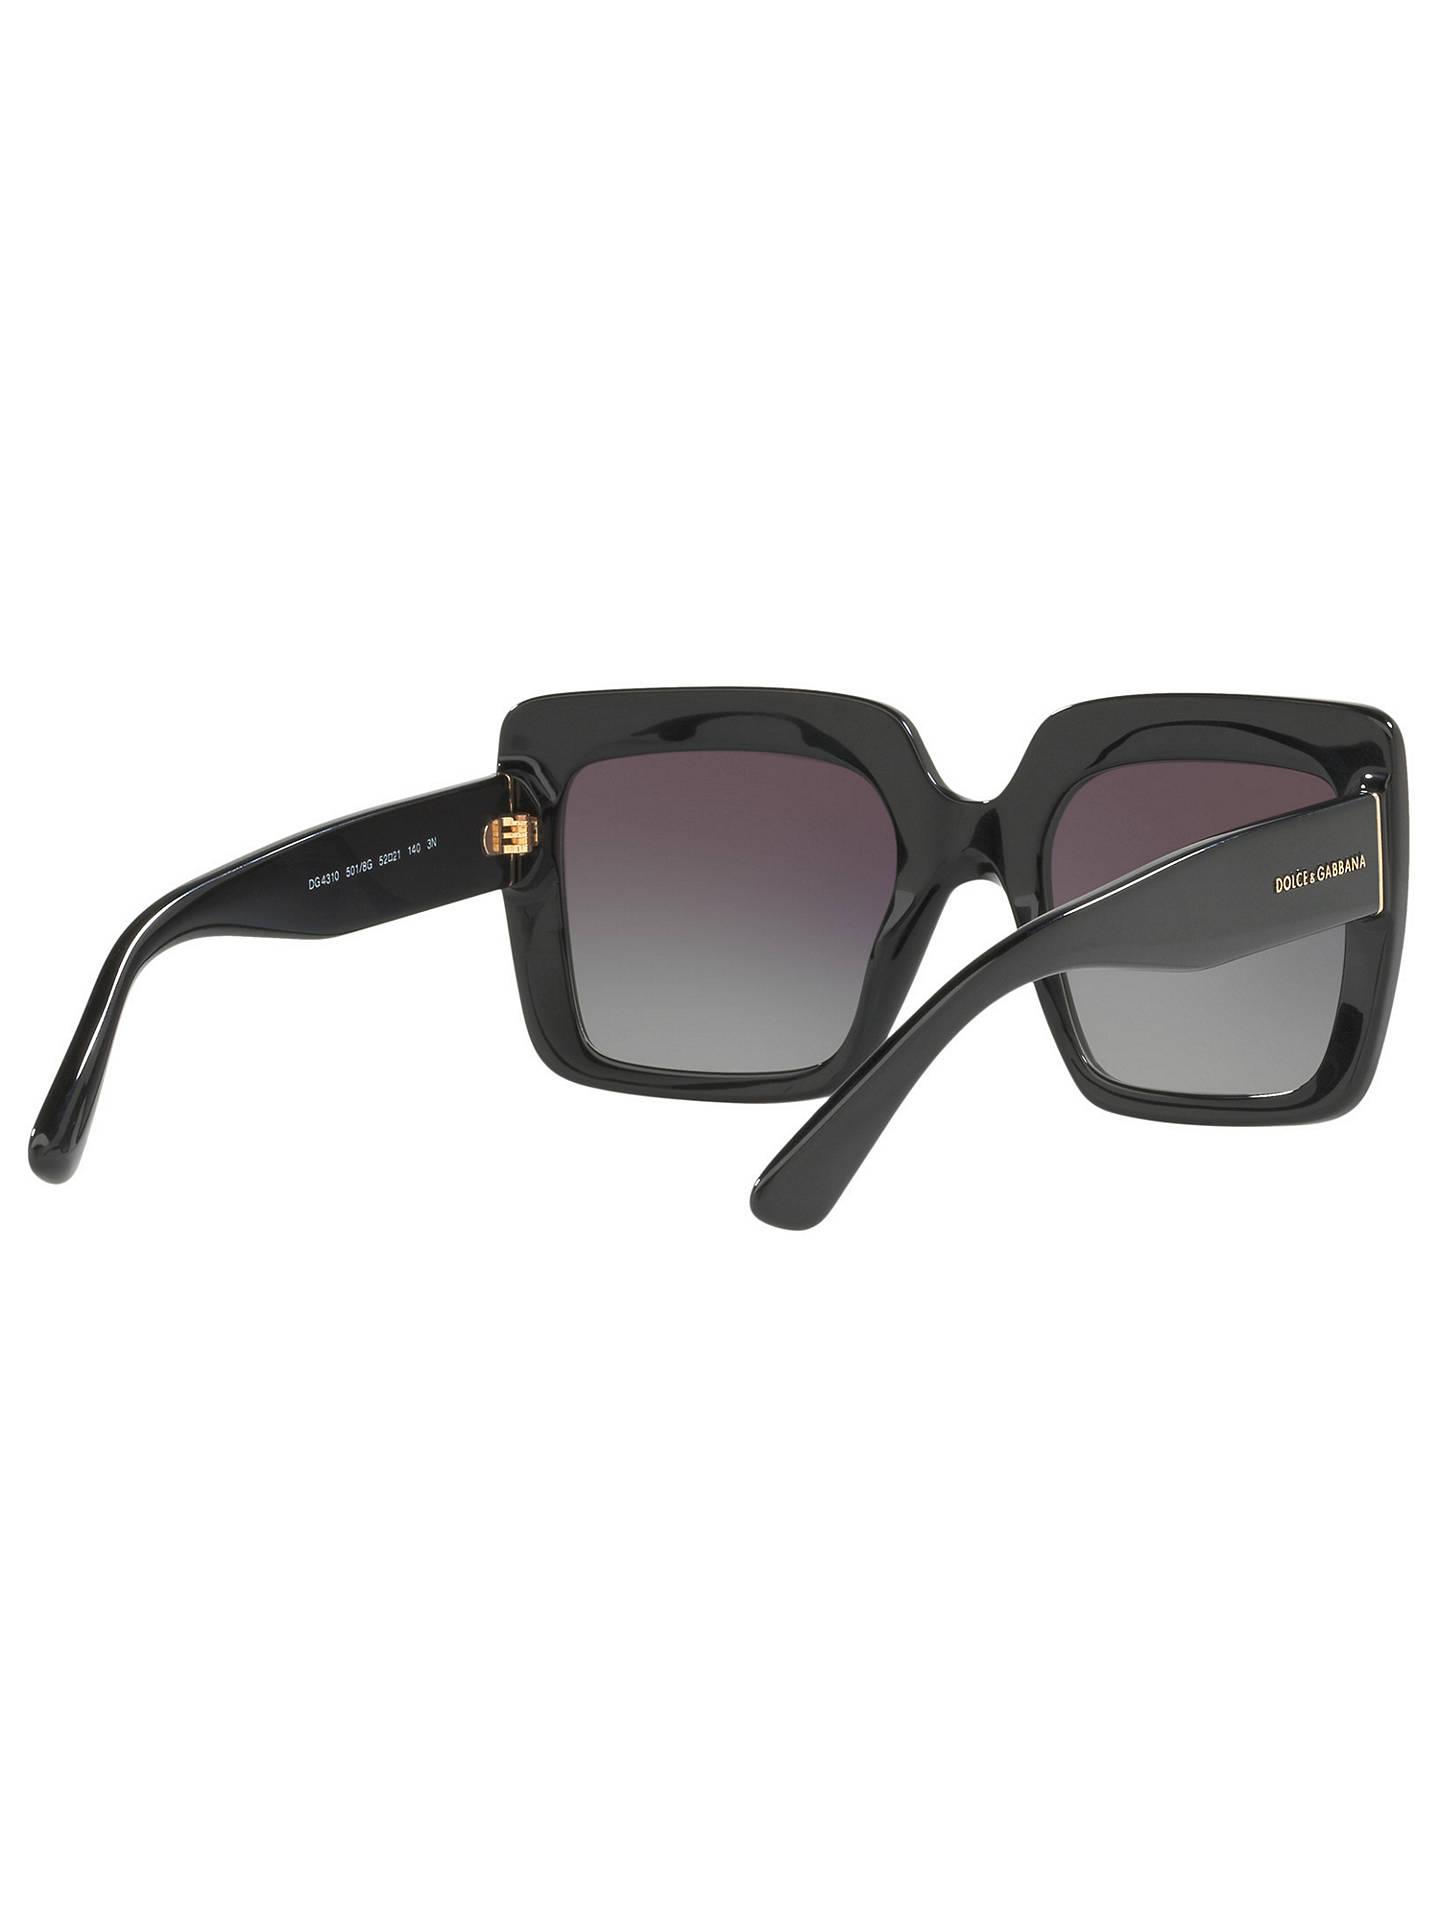 628a9a31f897 ... Buy Dolce   Gabbana DG4310 Oversize Square Sunglasses